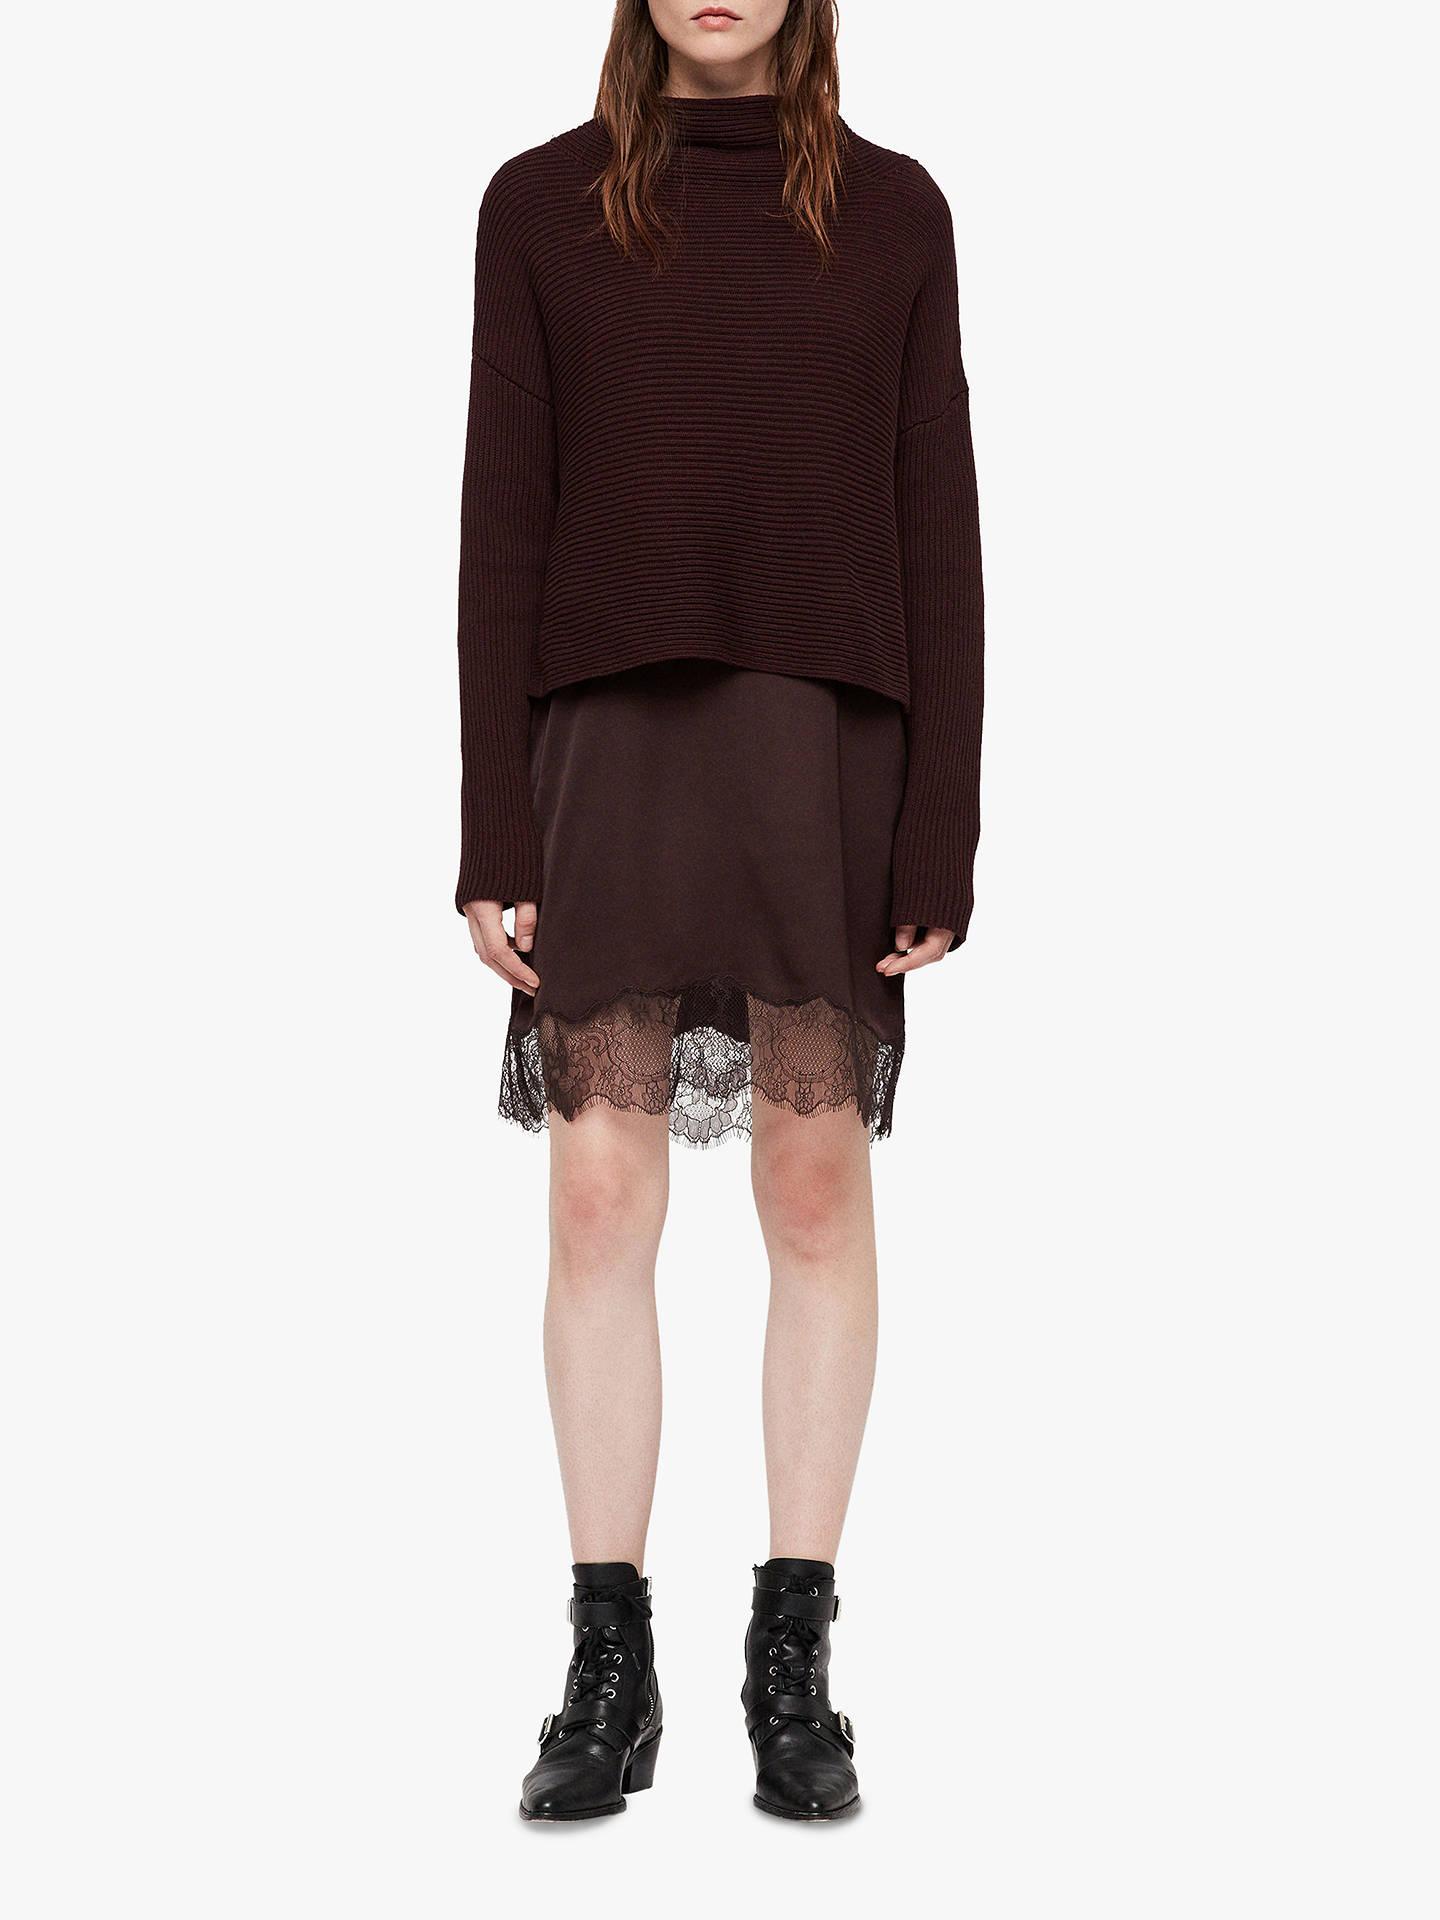 AllSaints Eloise Long Sleeve Dress at John Lewis & Partners